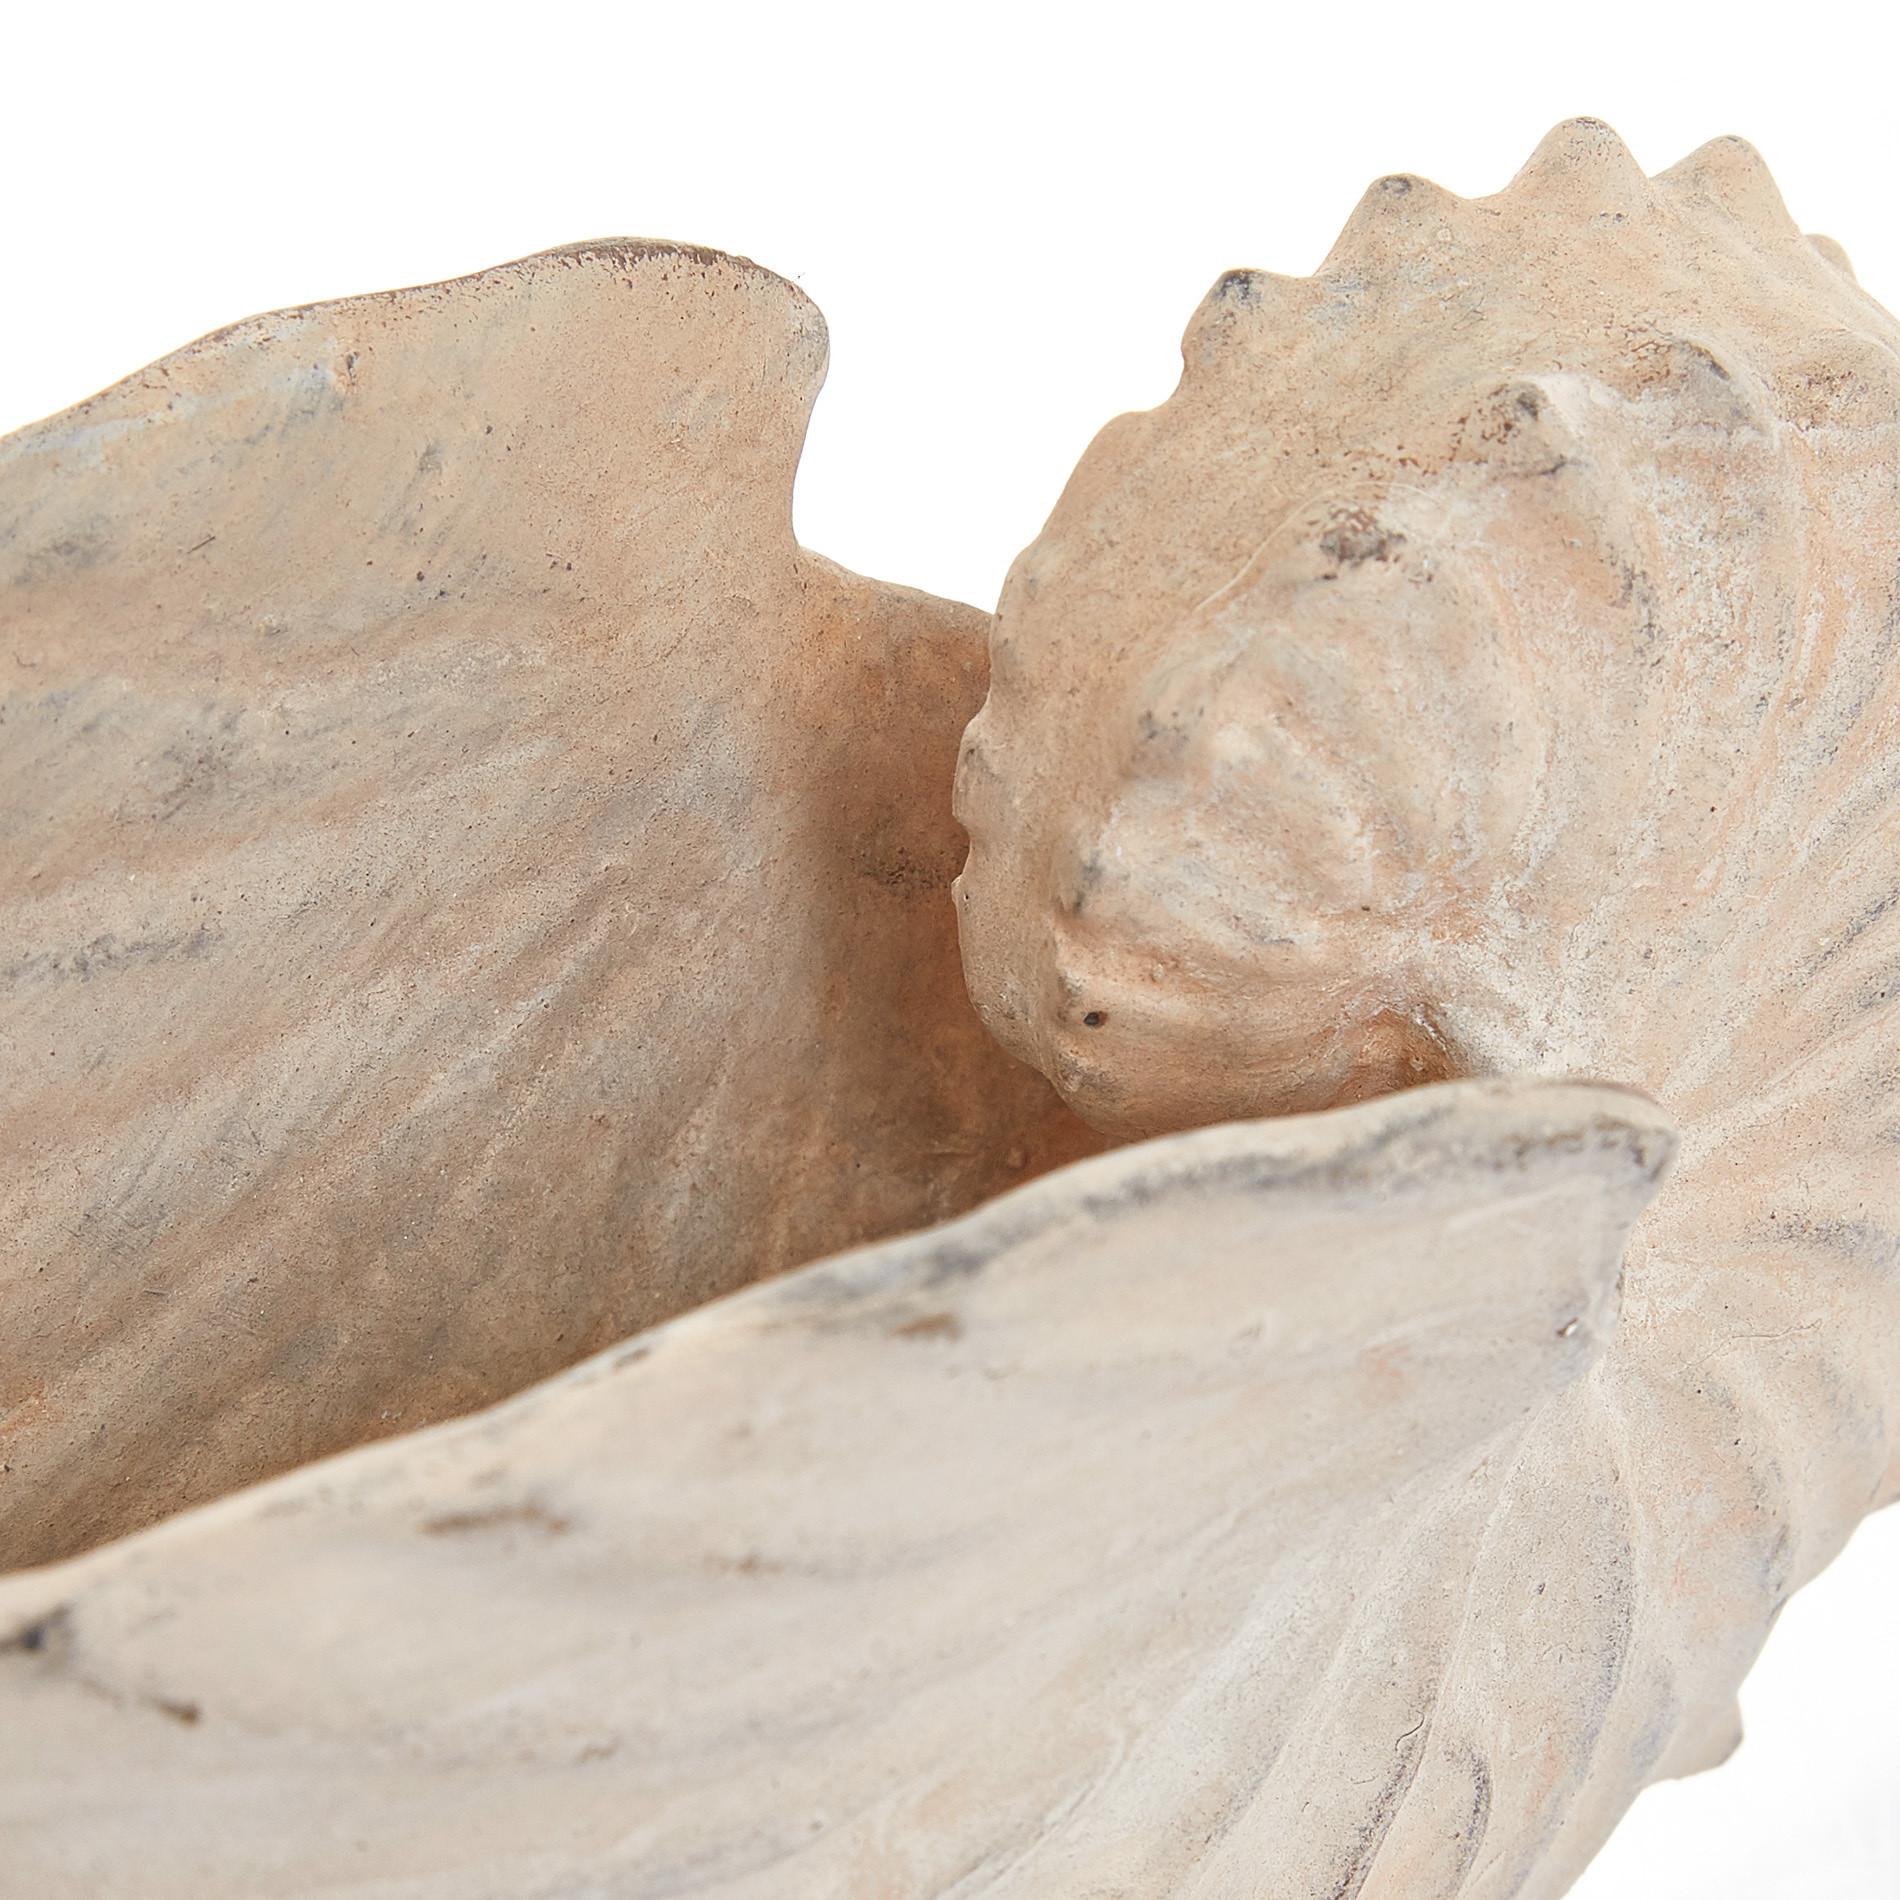 Conchiglia decorativa rifinita a mano, Bianco, large image number 1